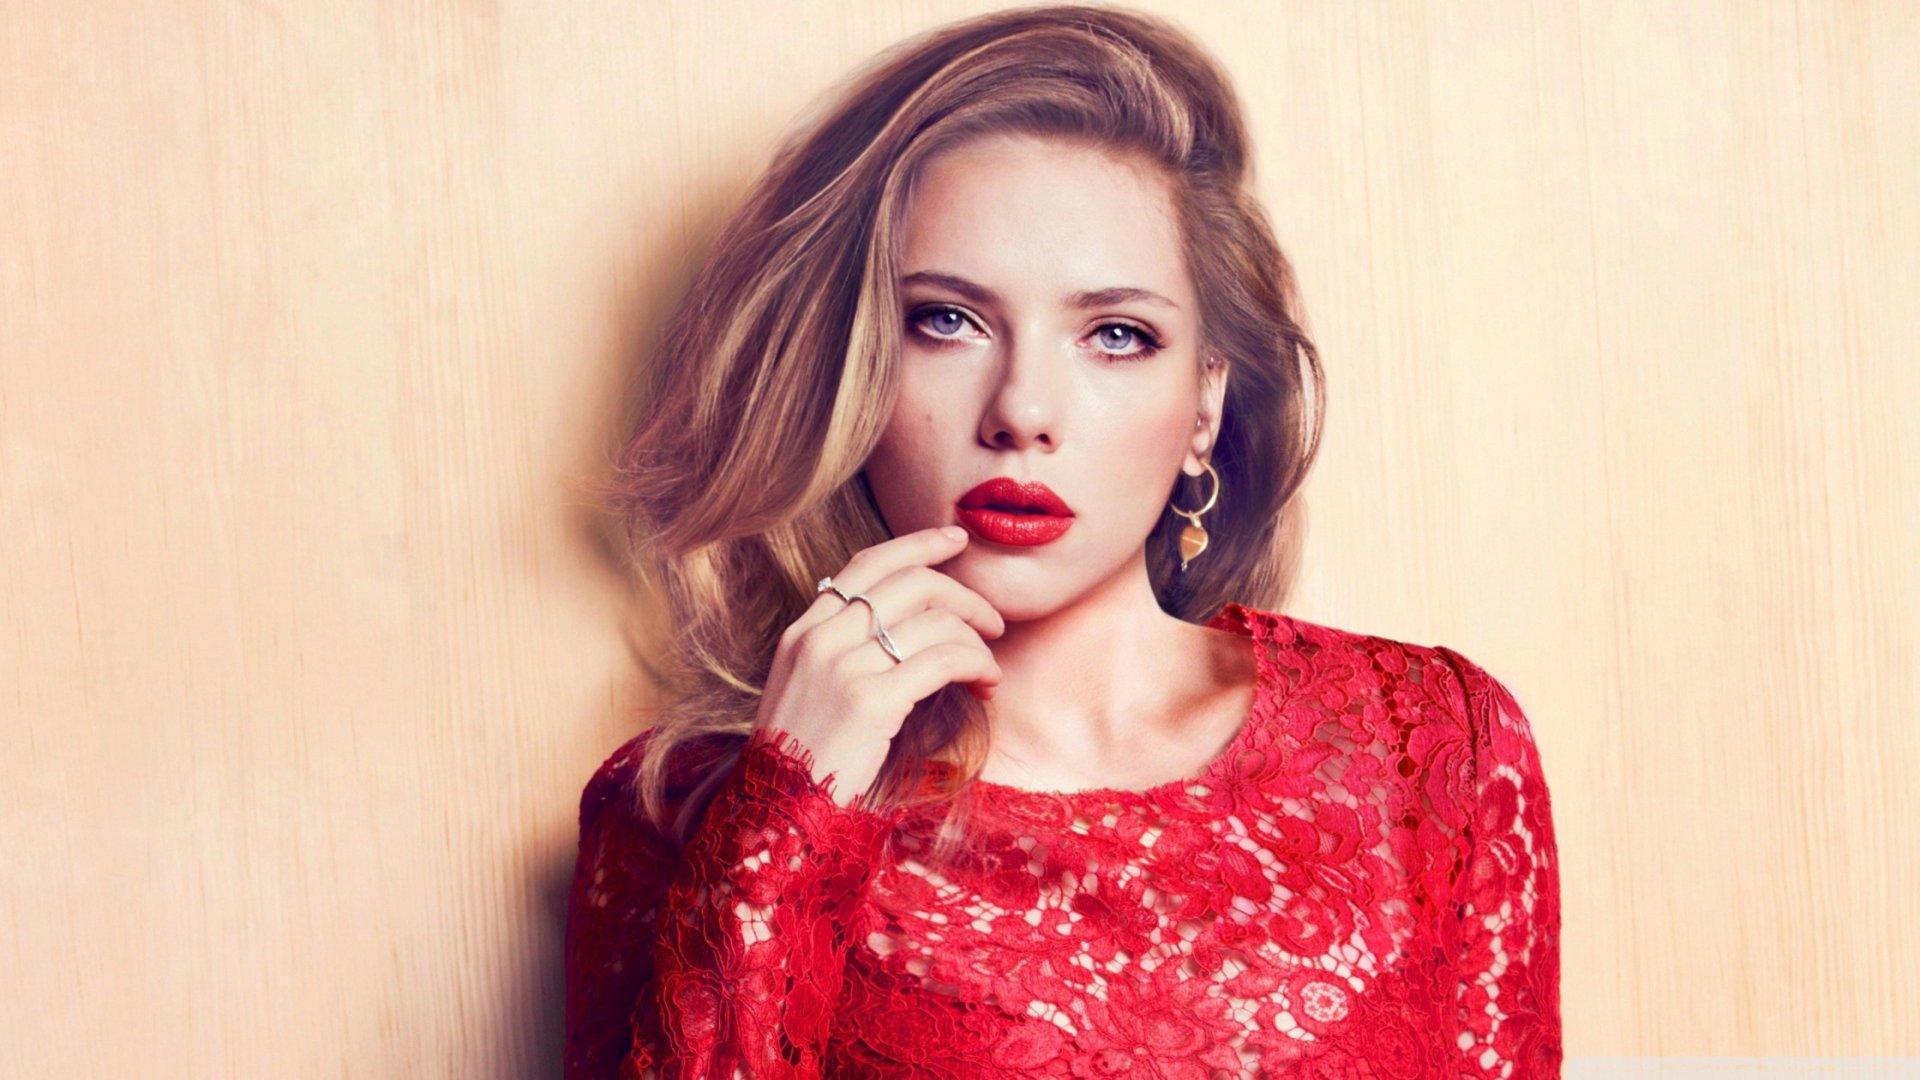 Celebrity - Scarlett Johansson  Blue Eyes Blonde Lipstick American Actress Wallpaper